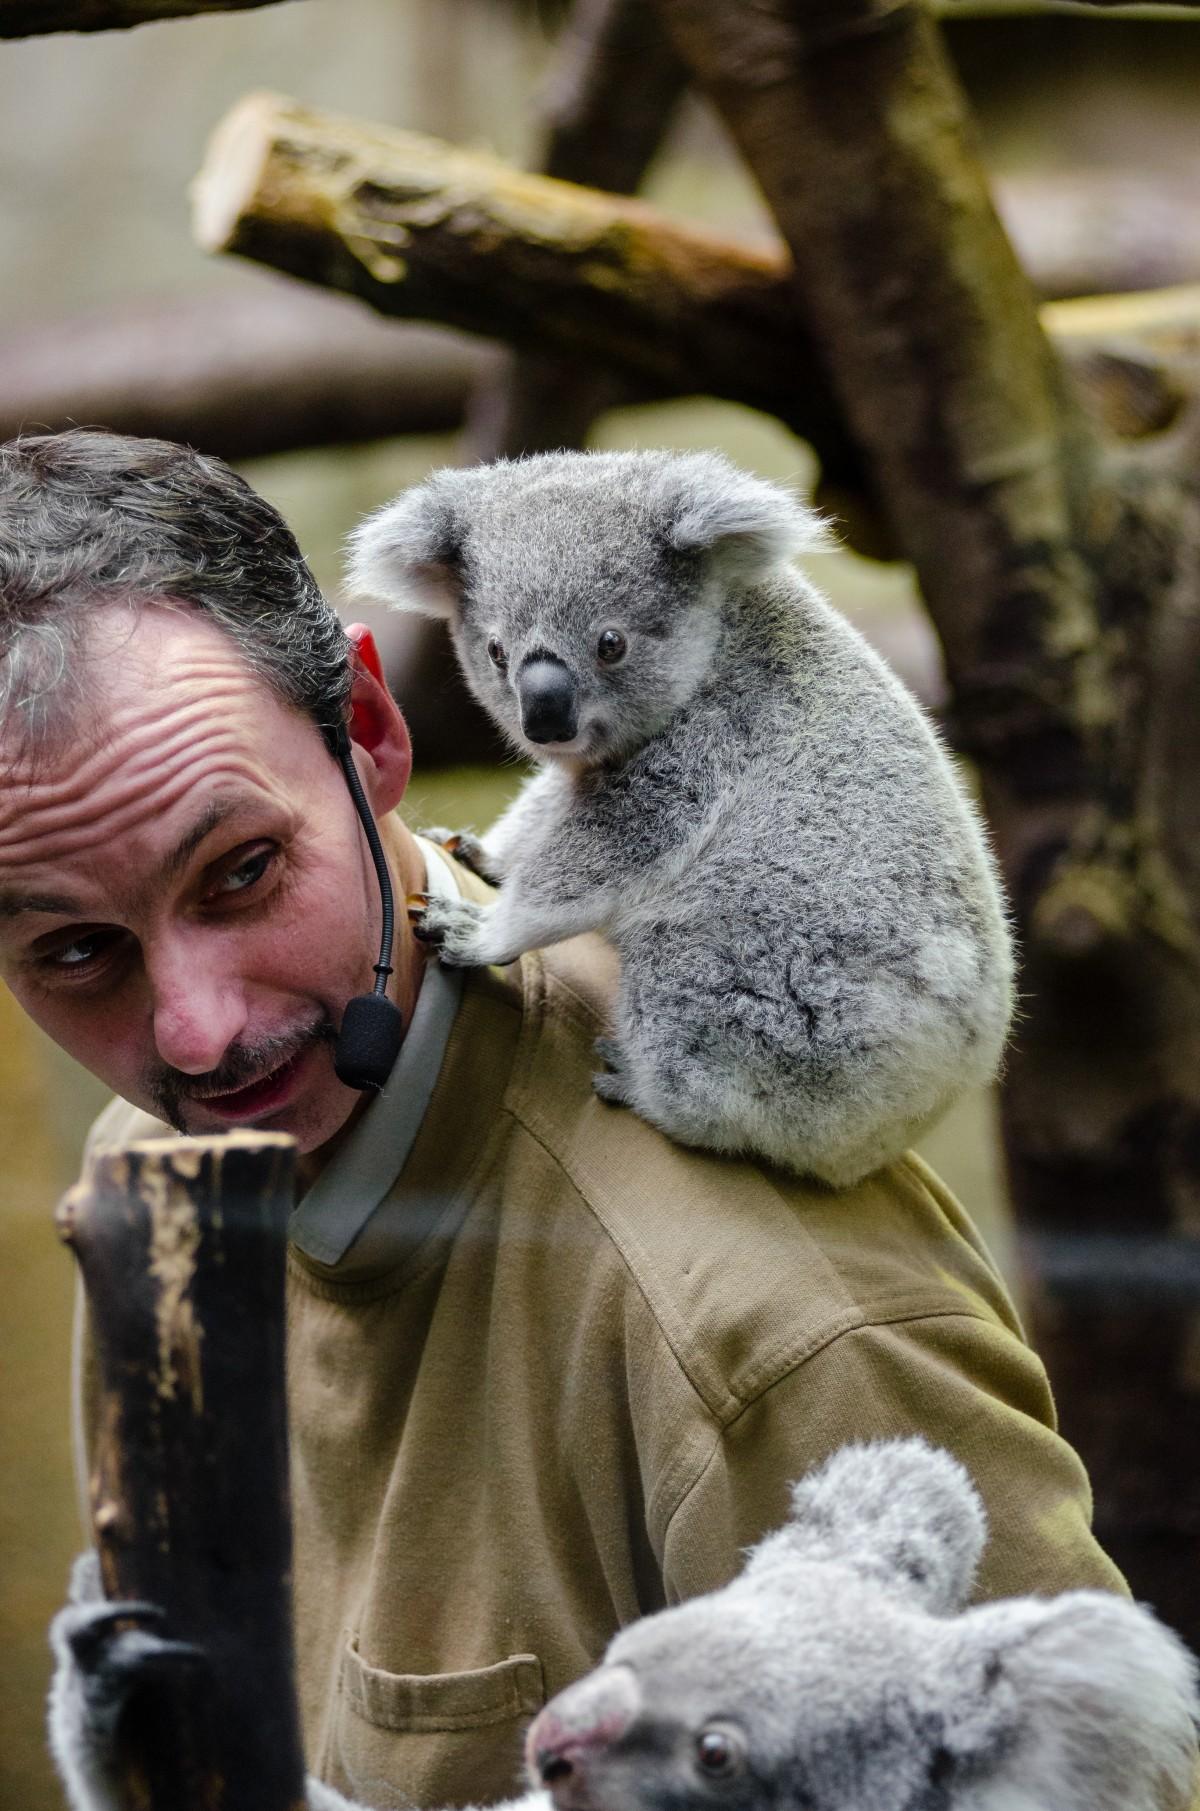 free images tree animal cute wildlife zoo fur small mammal baby fauna primate. Black Bedroom Furniture Sets. Home Design Ideas